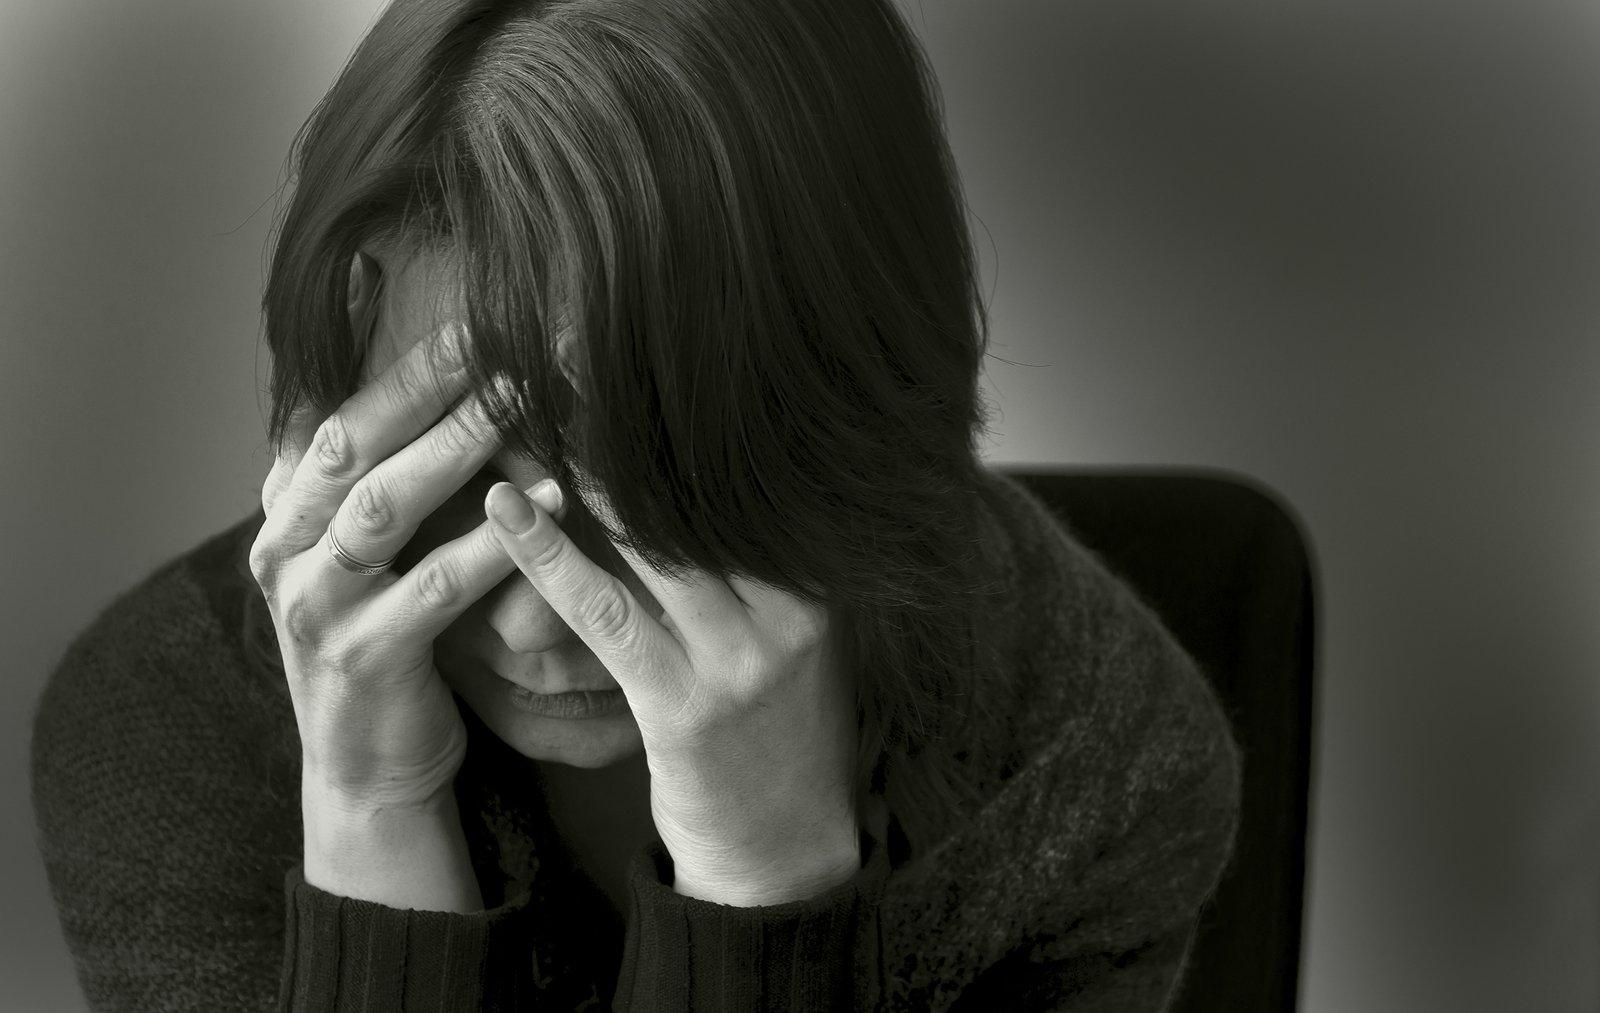 Dizziness and mental health issues - D. Kim Bell, DPT - San Diego, CA Vertigo Therapist